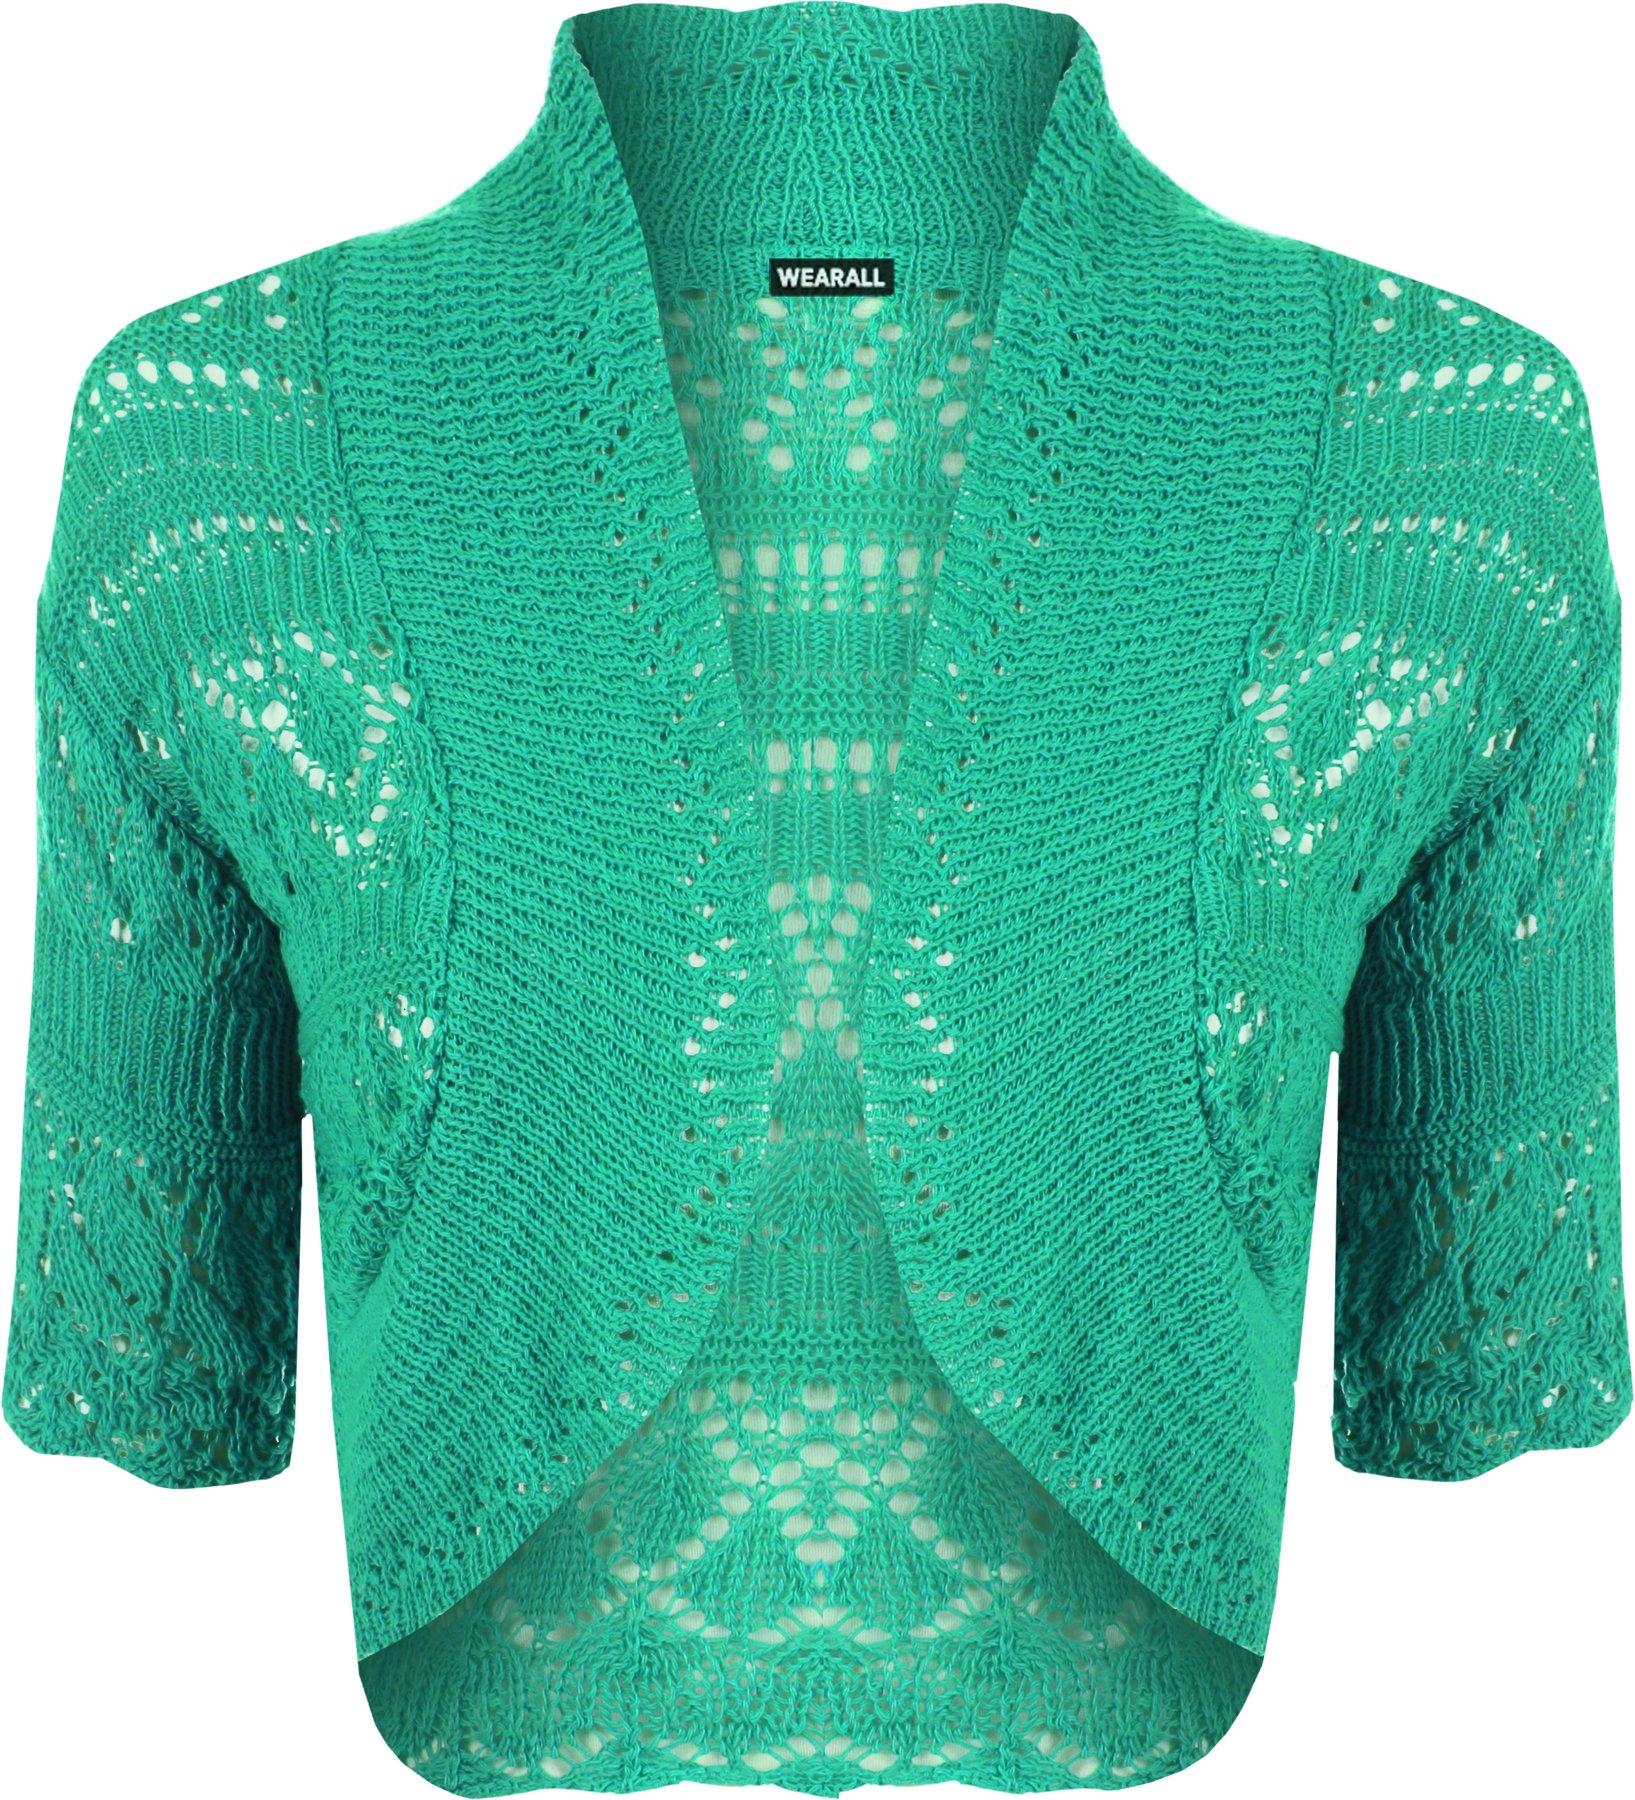 WearAll Womens Knitted Bolero Short Sleeve Shrug - Green - 4-6